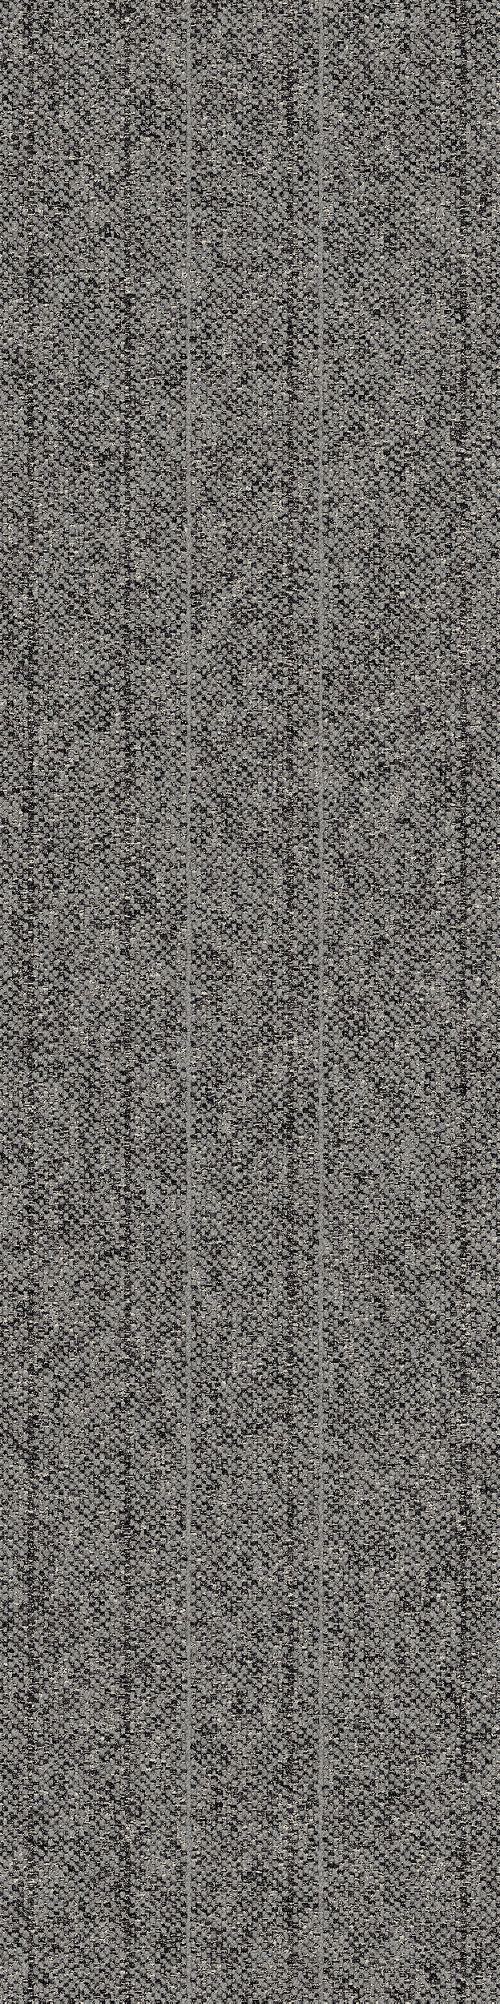 Interface carpet tile: WW860 Color name: Flannel